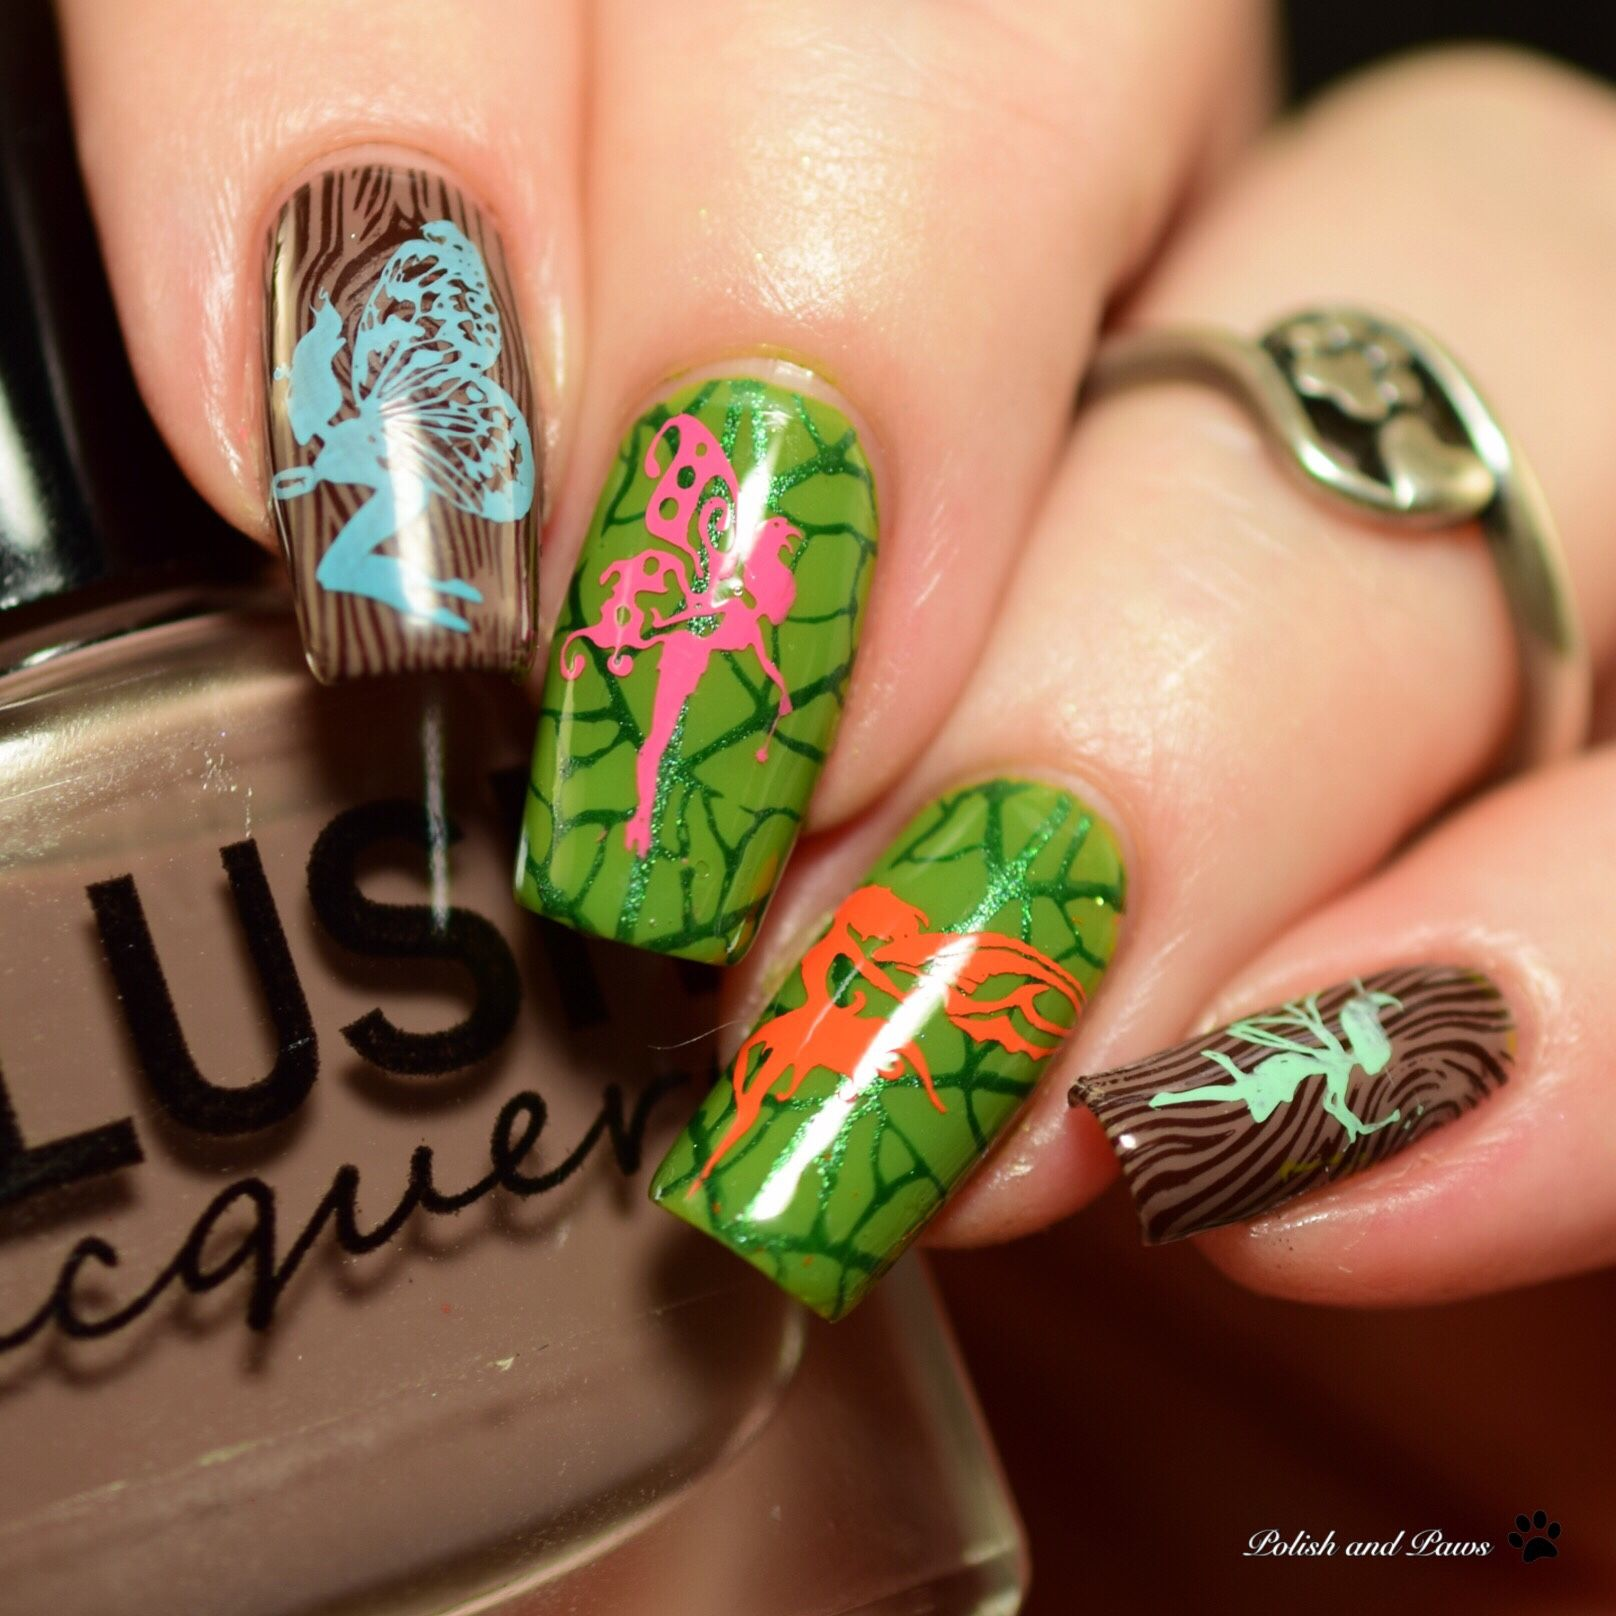 Fairy Nails | Nail Art Community Pins | Pinterest | Fairy, Nails ...